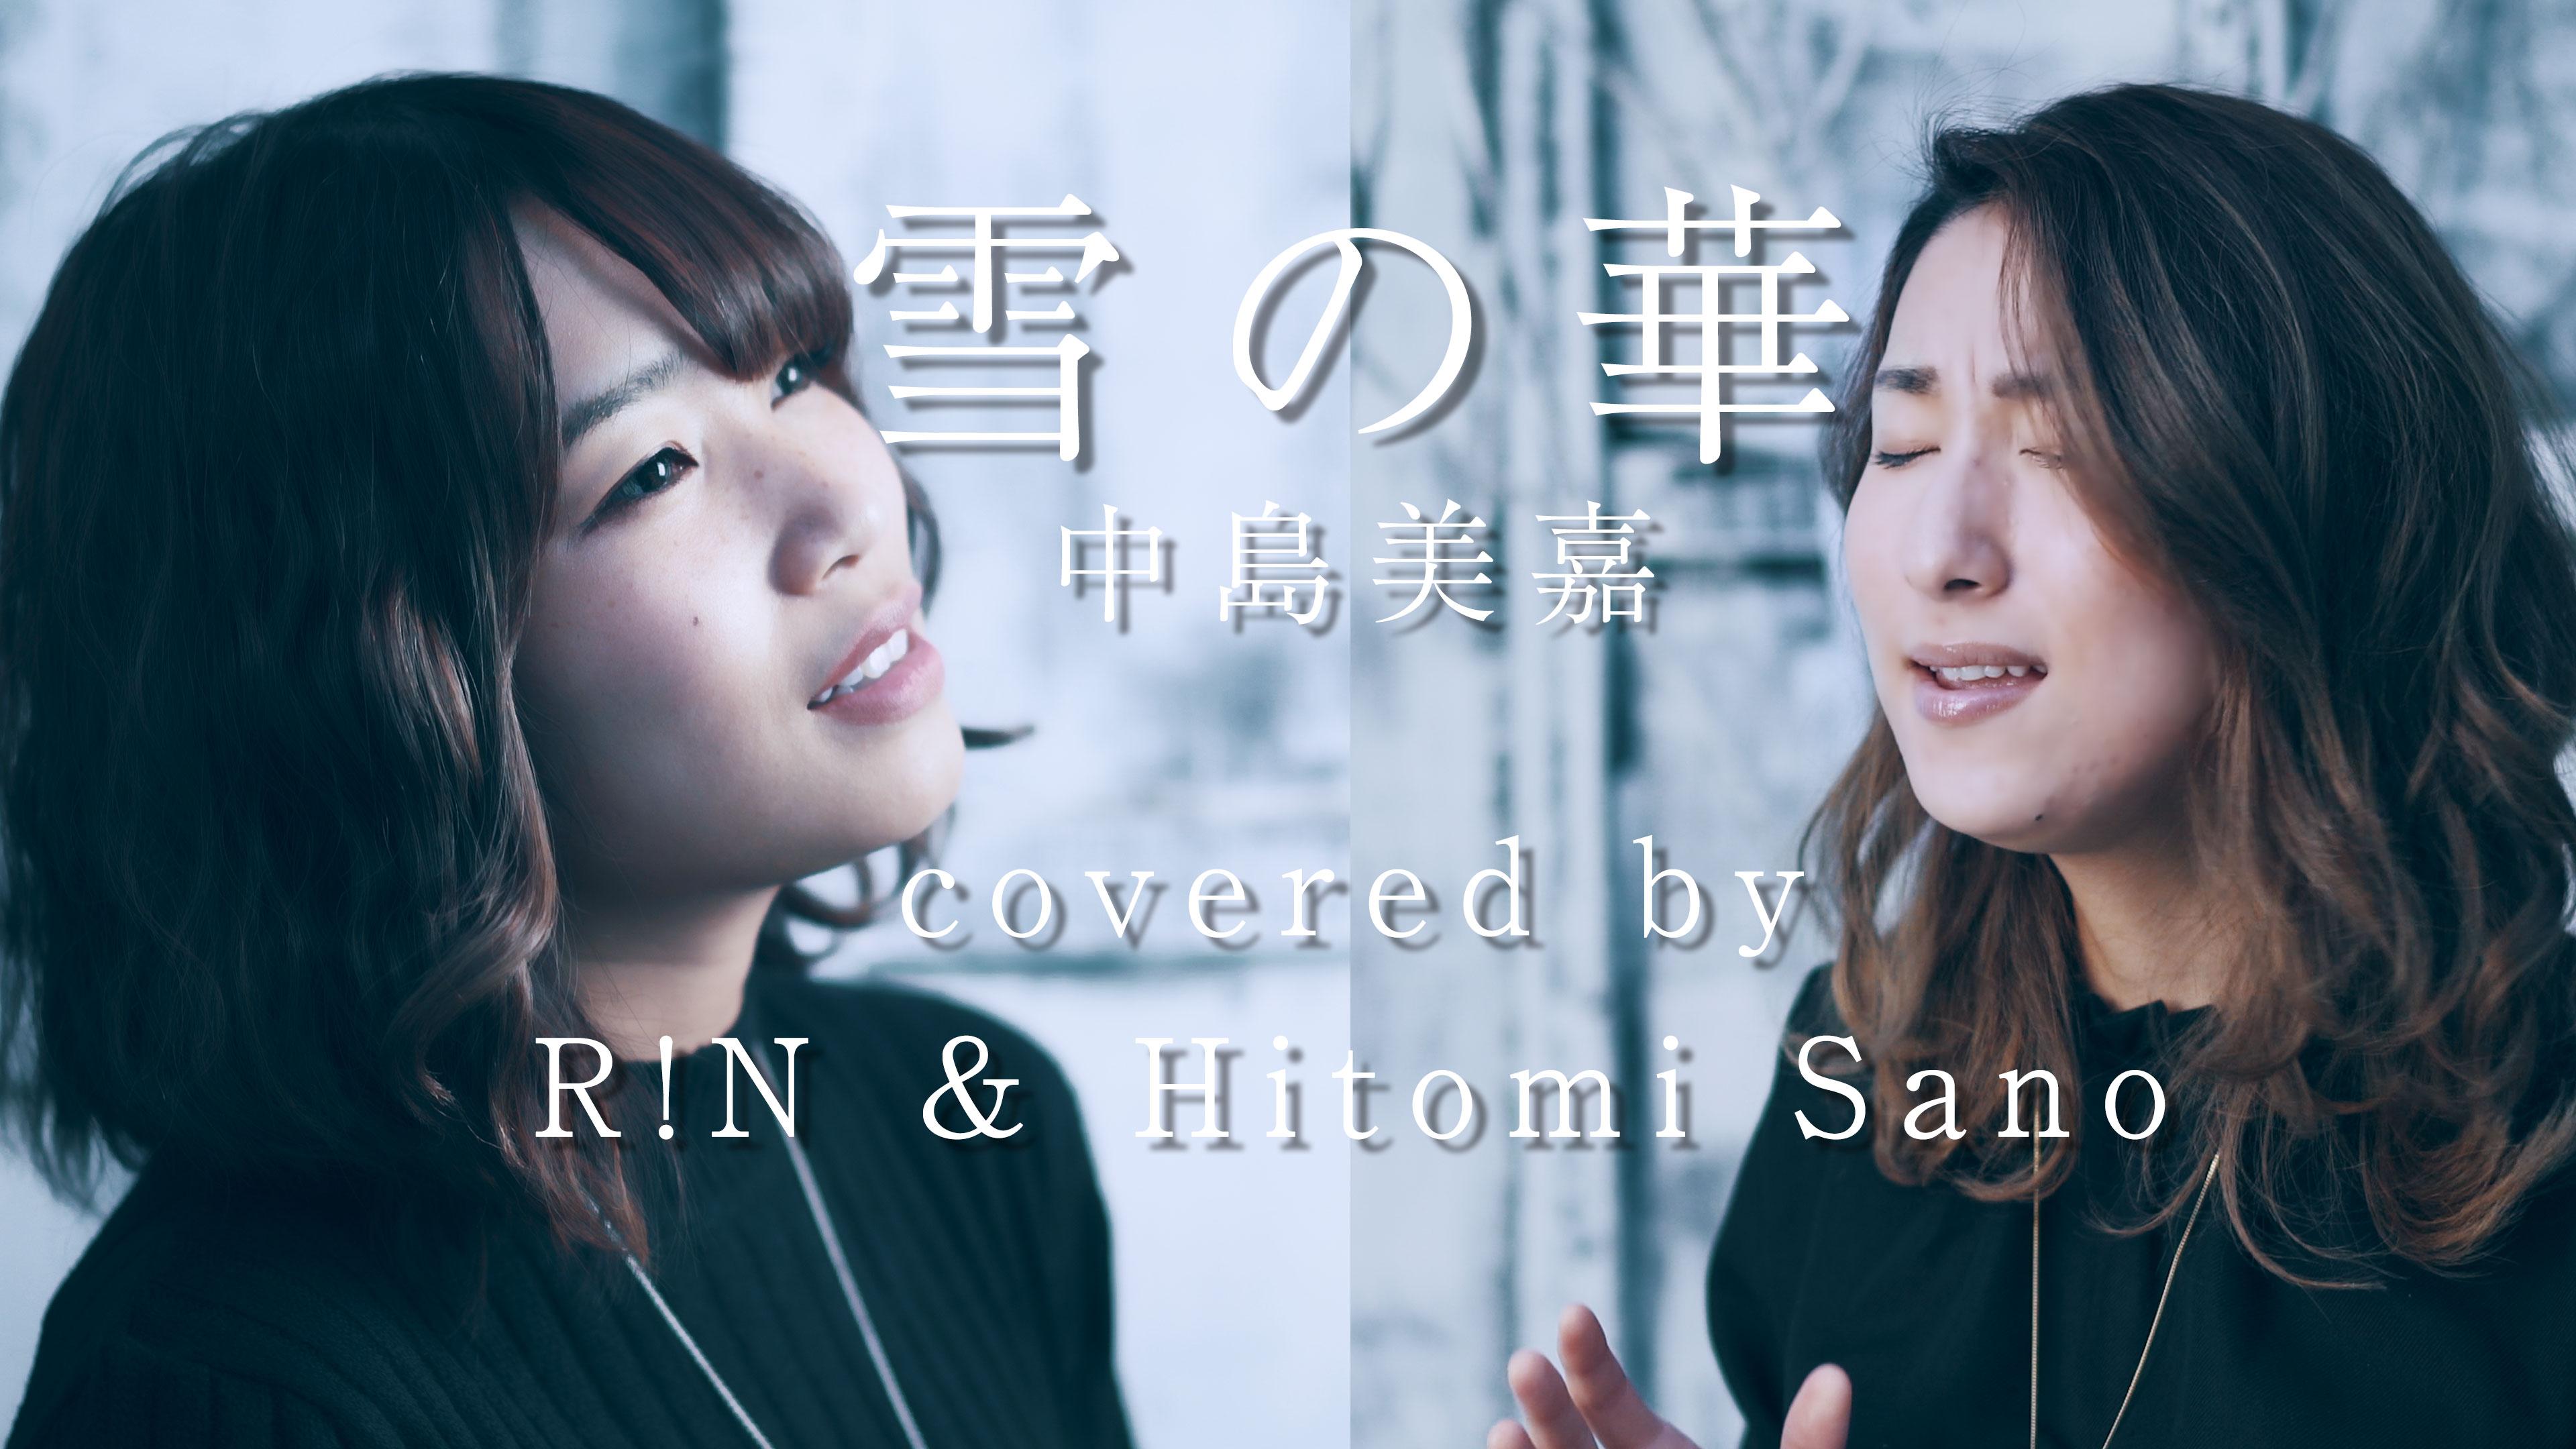 中島美嘉 雪の華 covered by 佐野仁美 & R!N